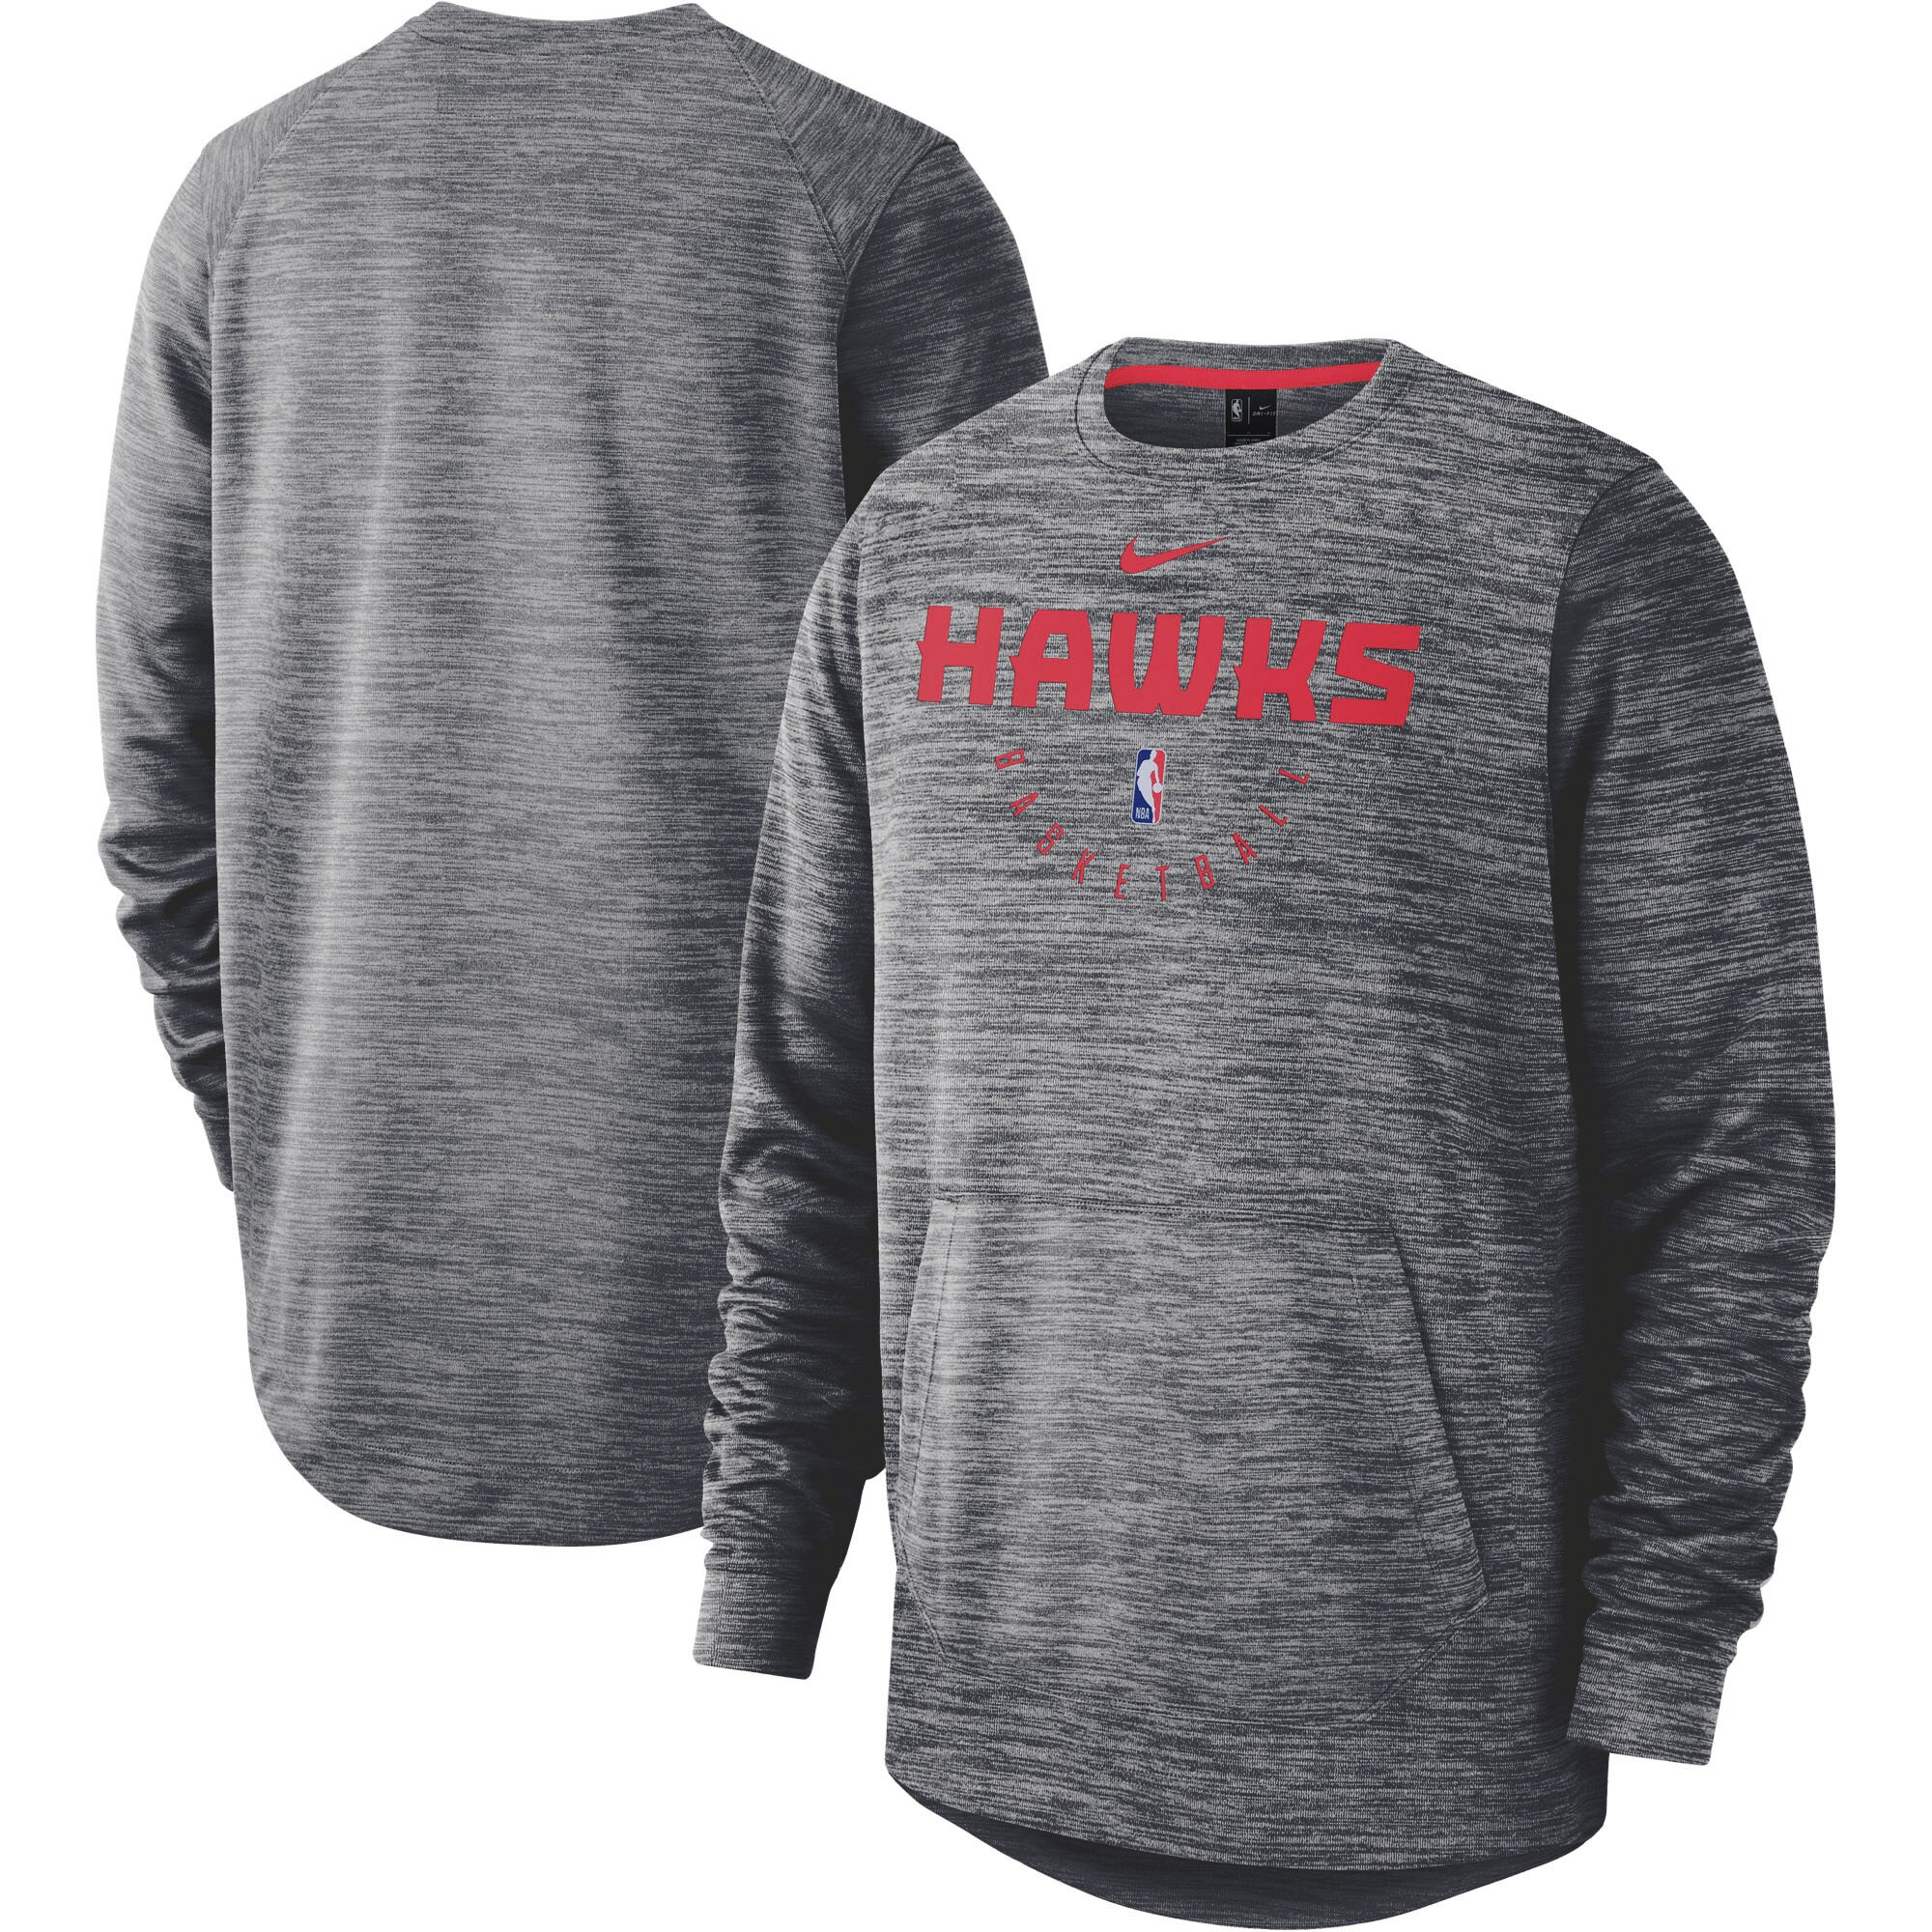 Atlanta Hawks Nike Spotlight Performance Pullover Sweatshirt - Heathered Gray